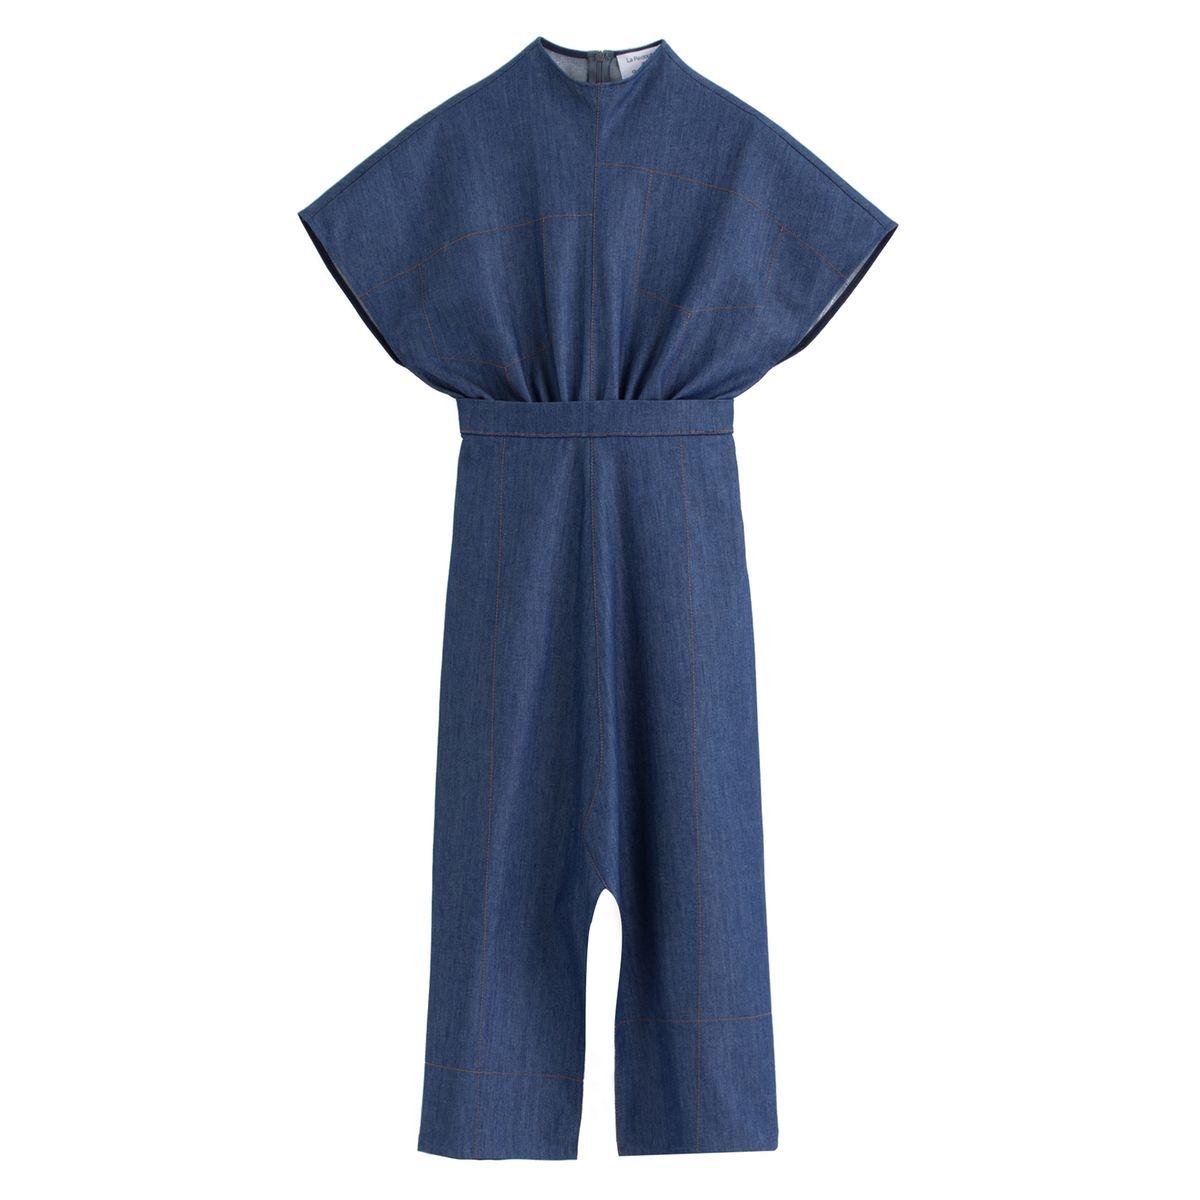 Robe longue en jean, sans manches